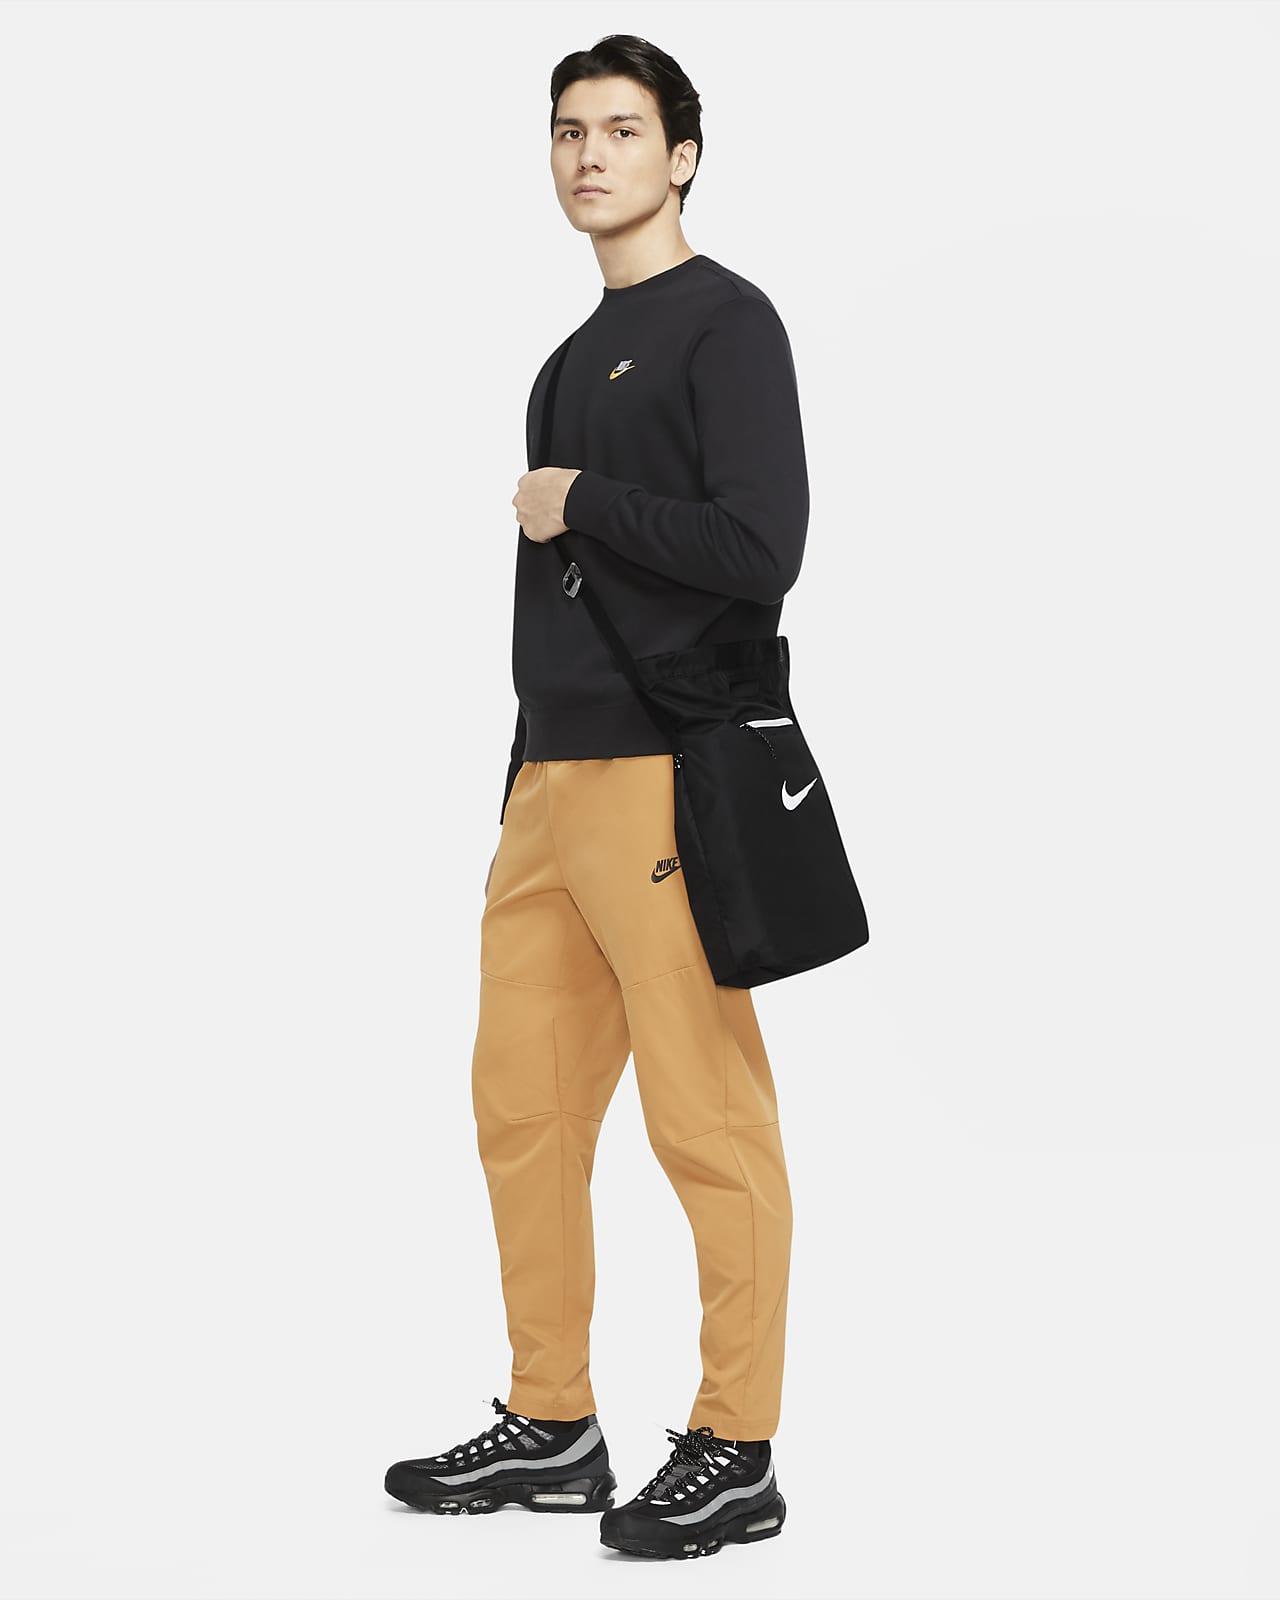 Bolsa de mano para almacenamiento Nike